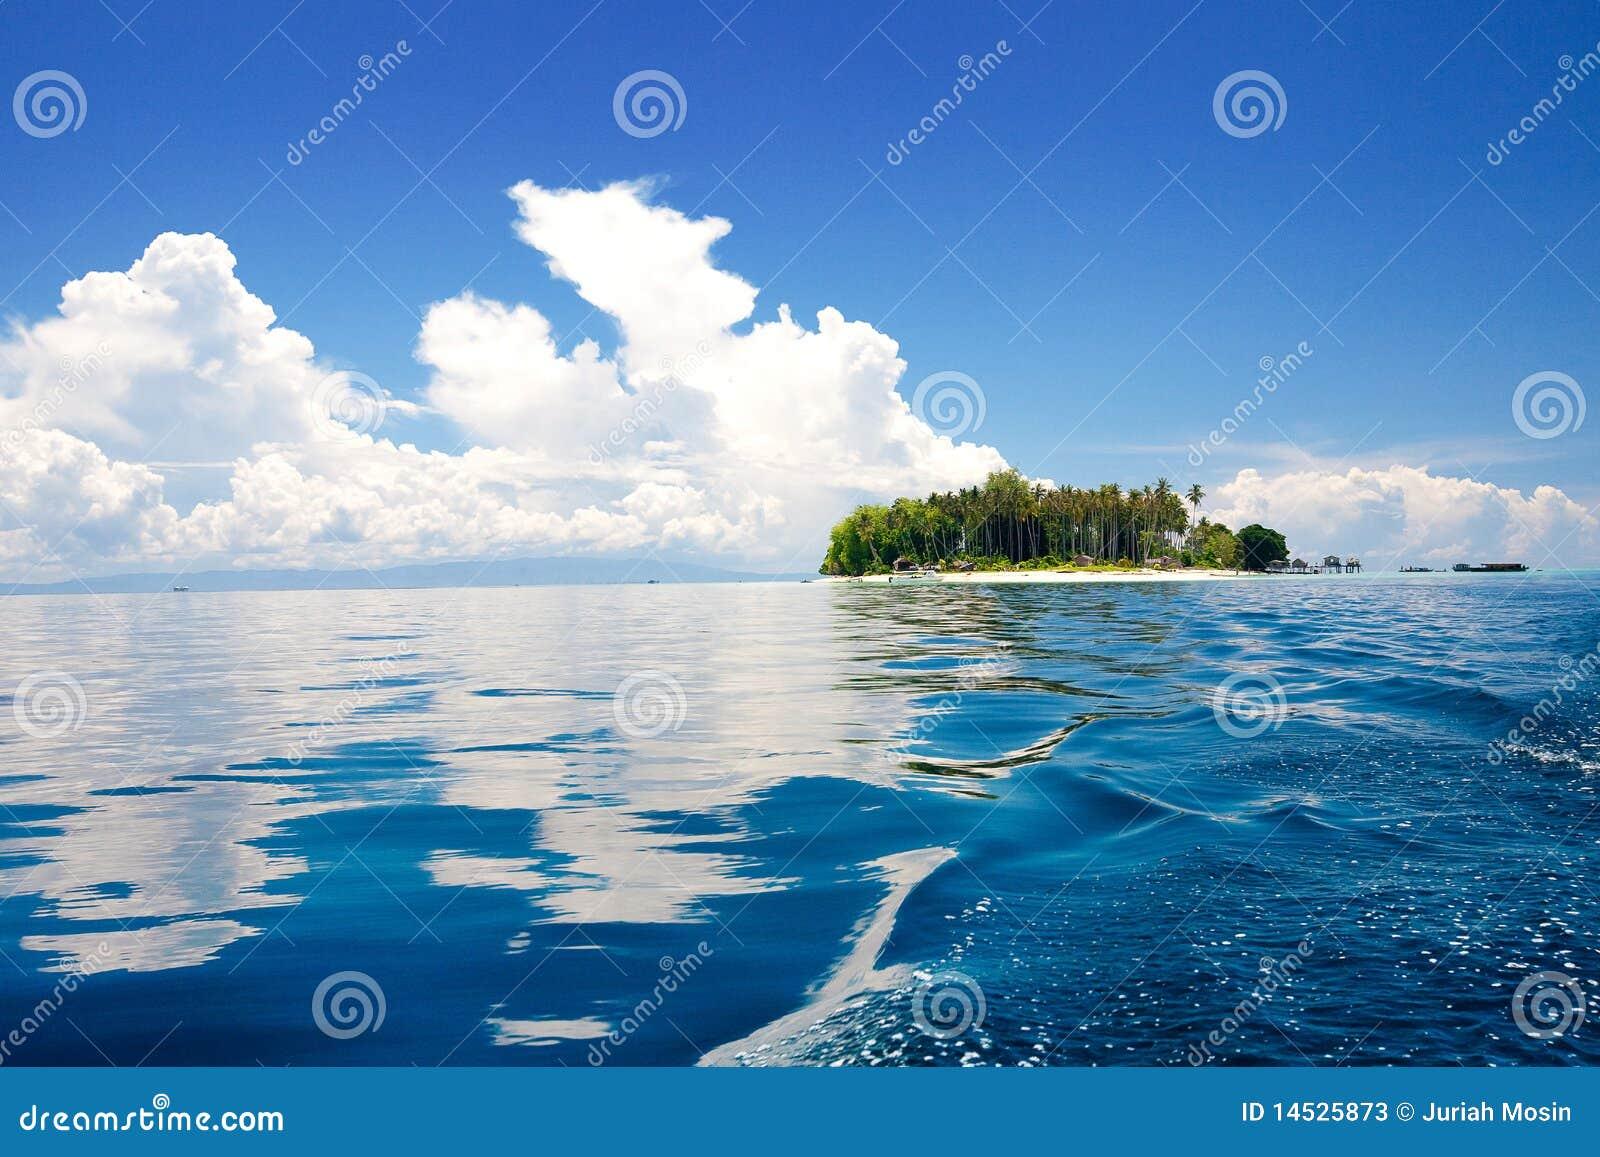 Tropical Island Sun: Tropical Island In The Sun With Blue Skies Stock Photos